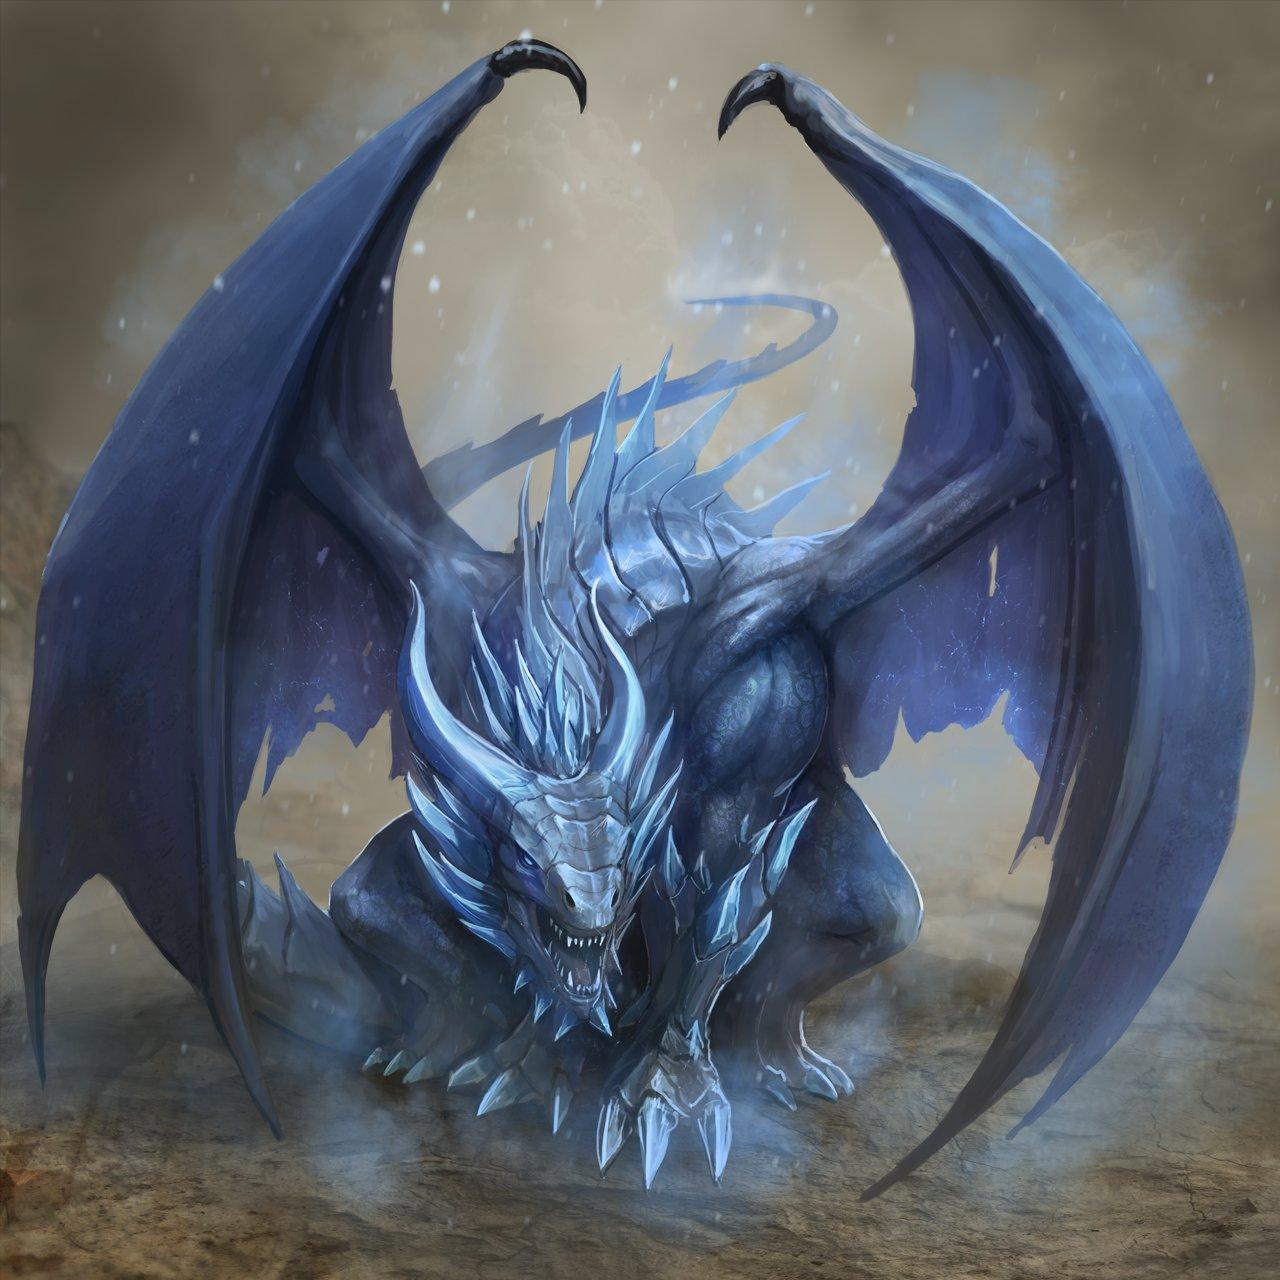 Картинка для Твой дракон по знаку зодиака.